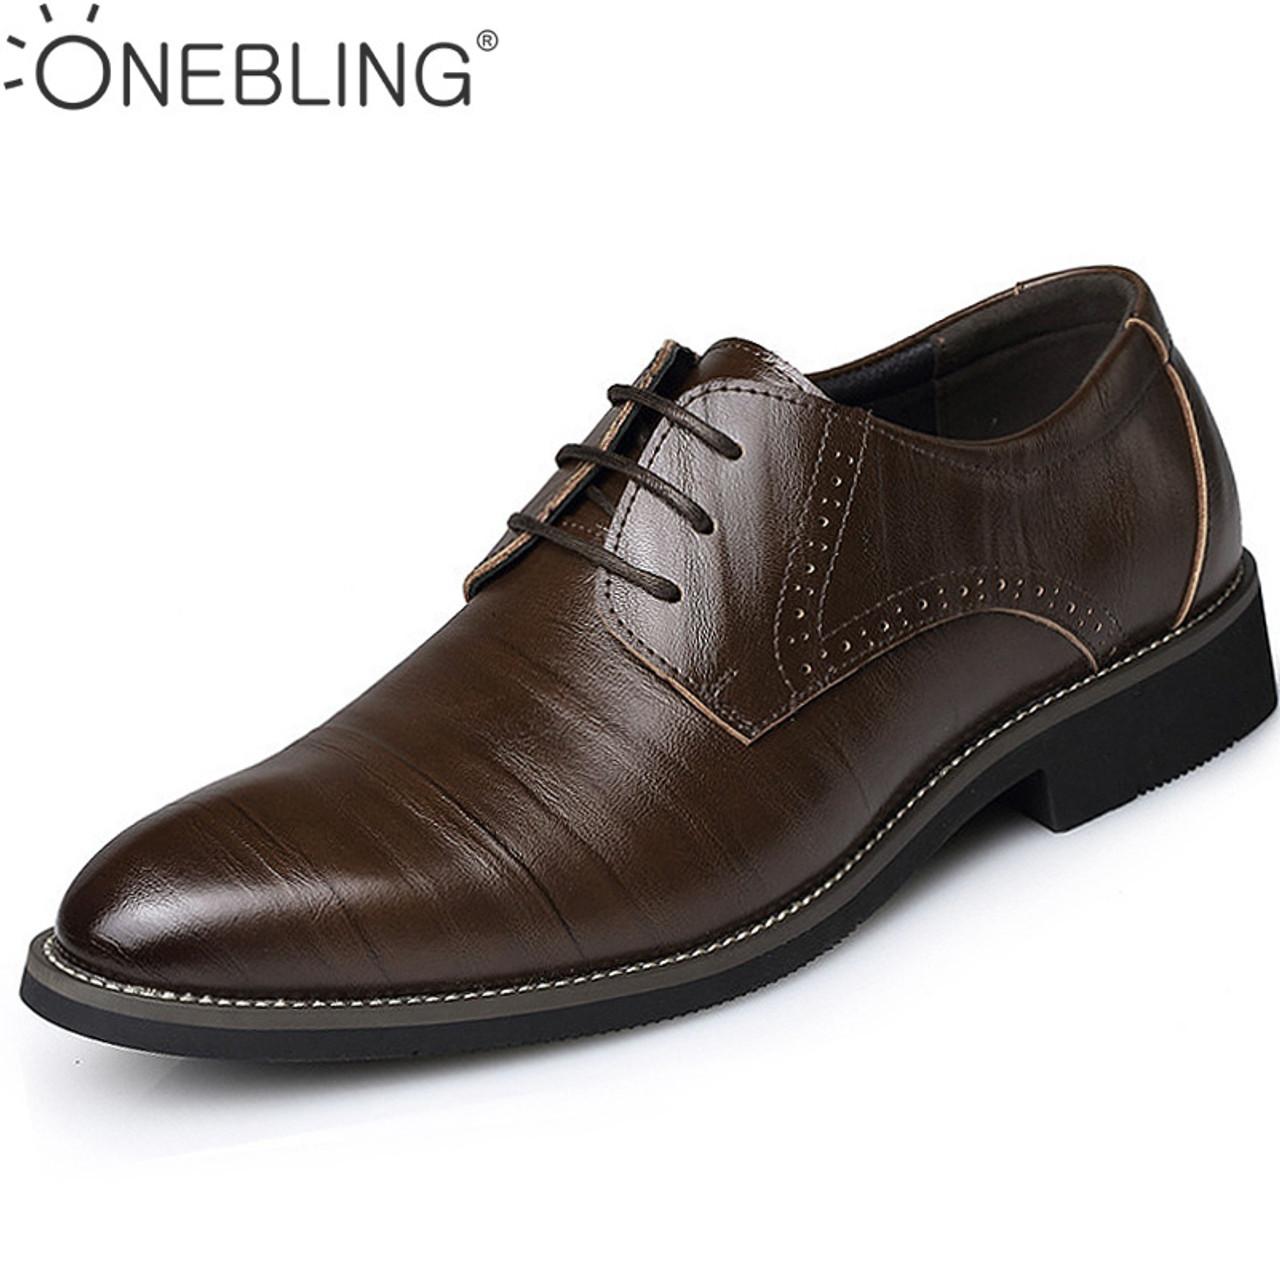 f00009389c7 Hot Sale Men Leather Dress Shoes 2017 Fashion Wedding Shoes Breathable Business  Shoes Lace-up ...